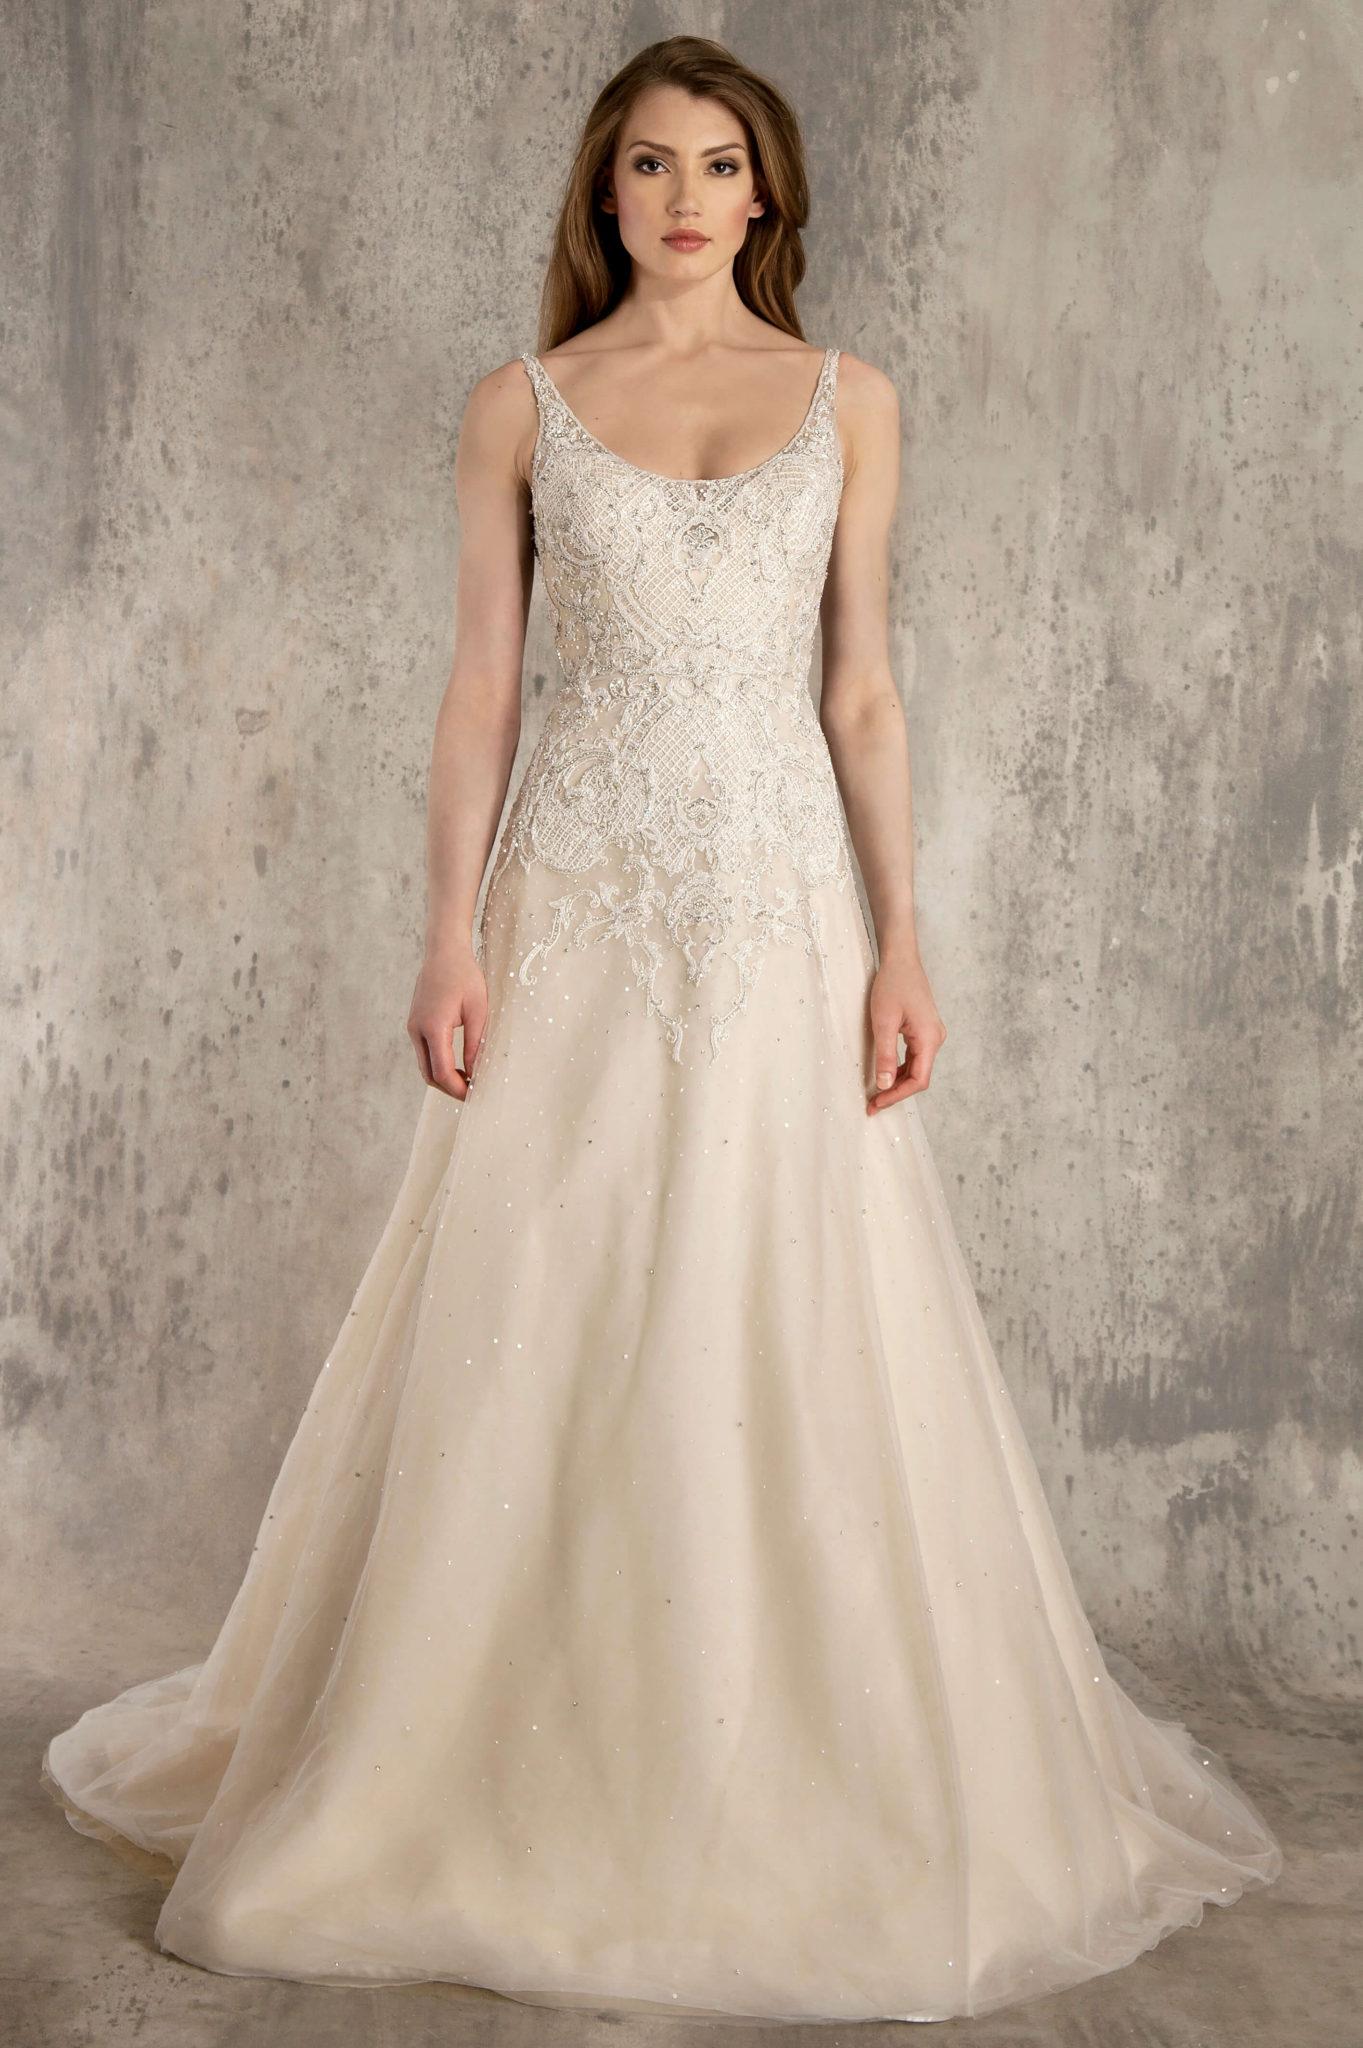 Bridal Trend Round-Up Fall 2018   Azazie   Blog   Kleinfeld Bridal Wedding Dresses